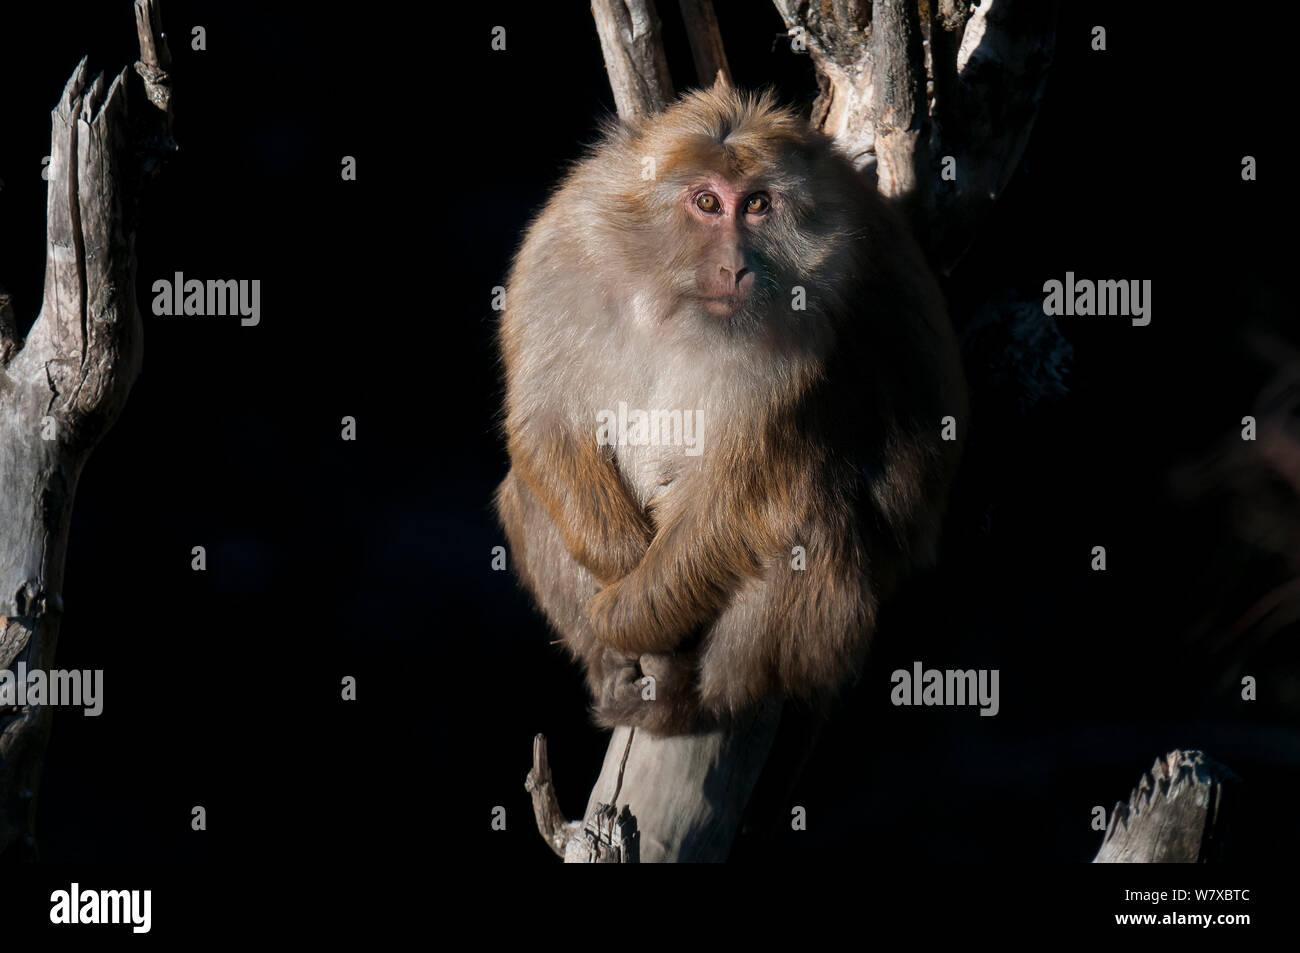 Assamese Stock Photos & Assamese Stock Images - Alamy